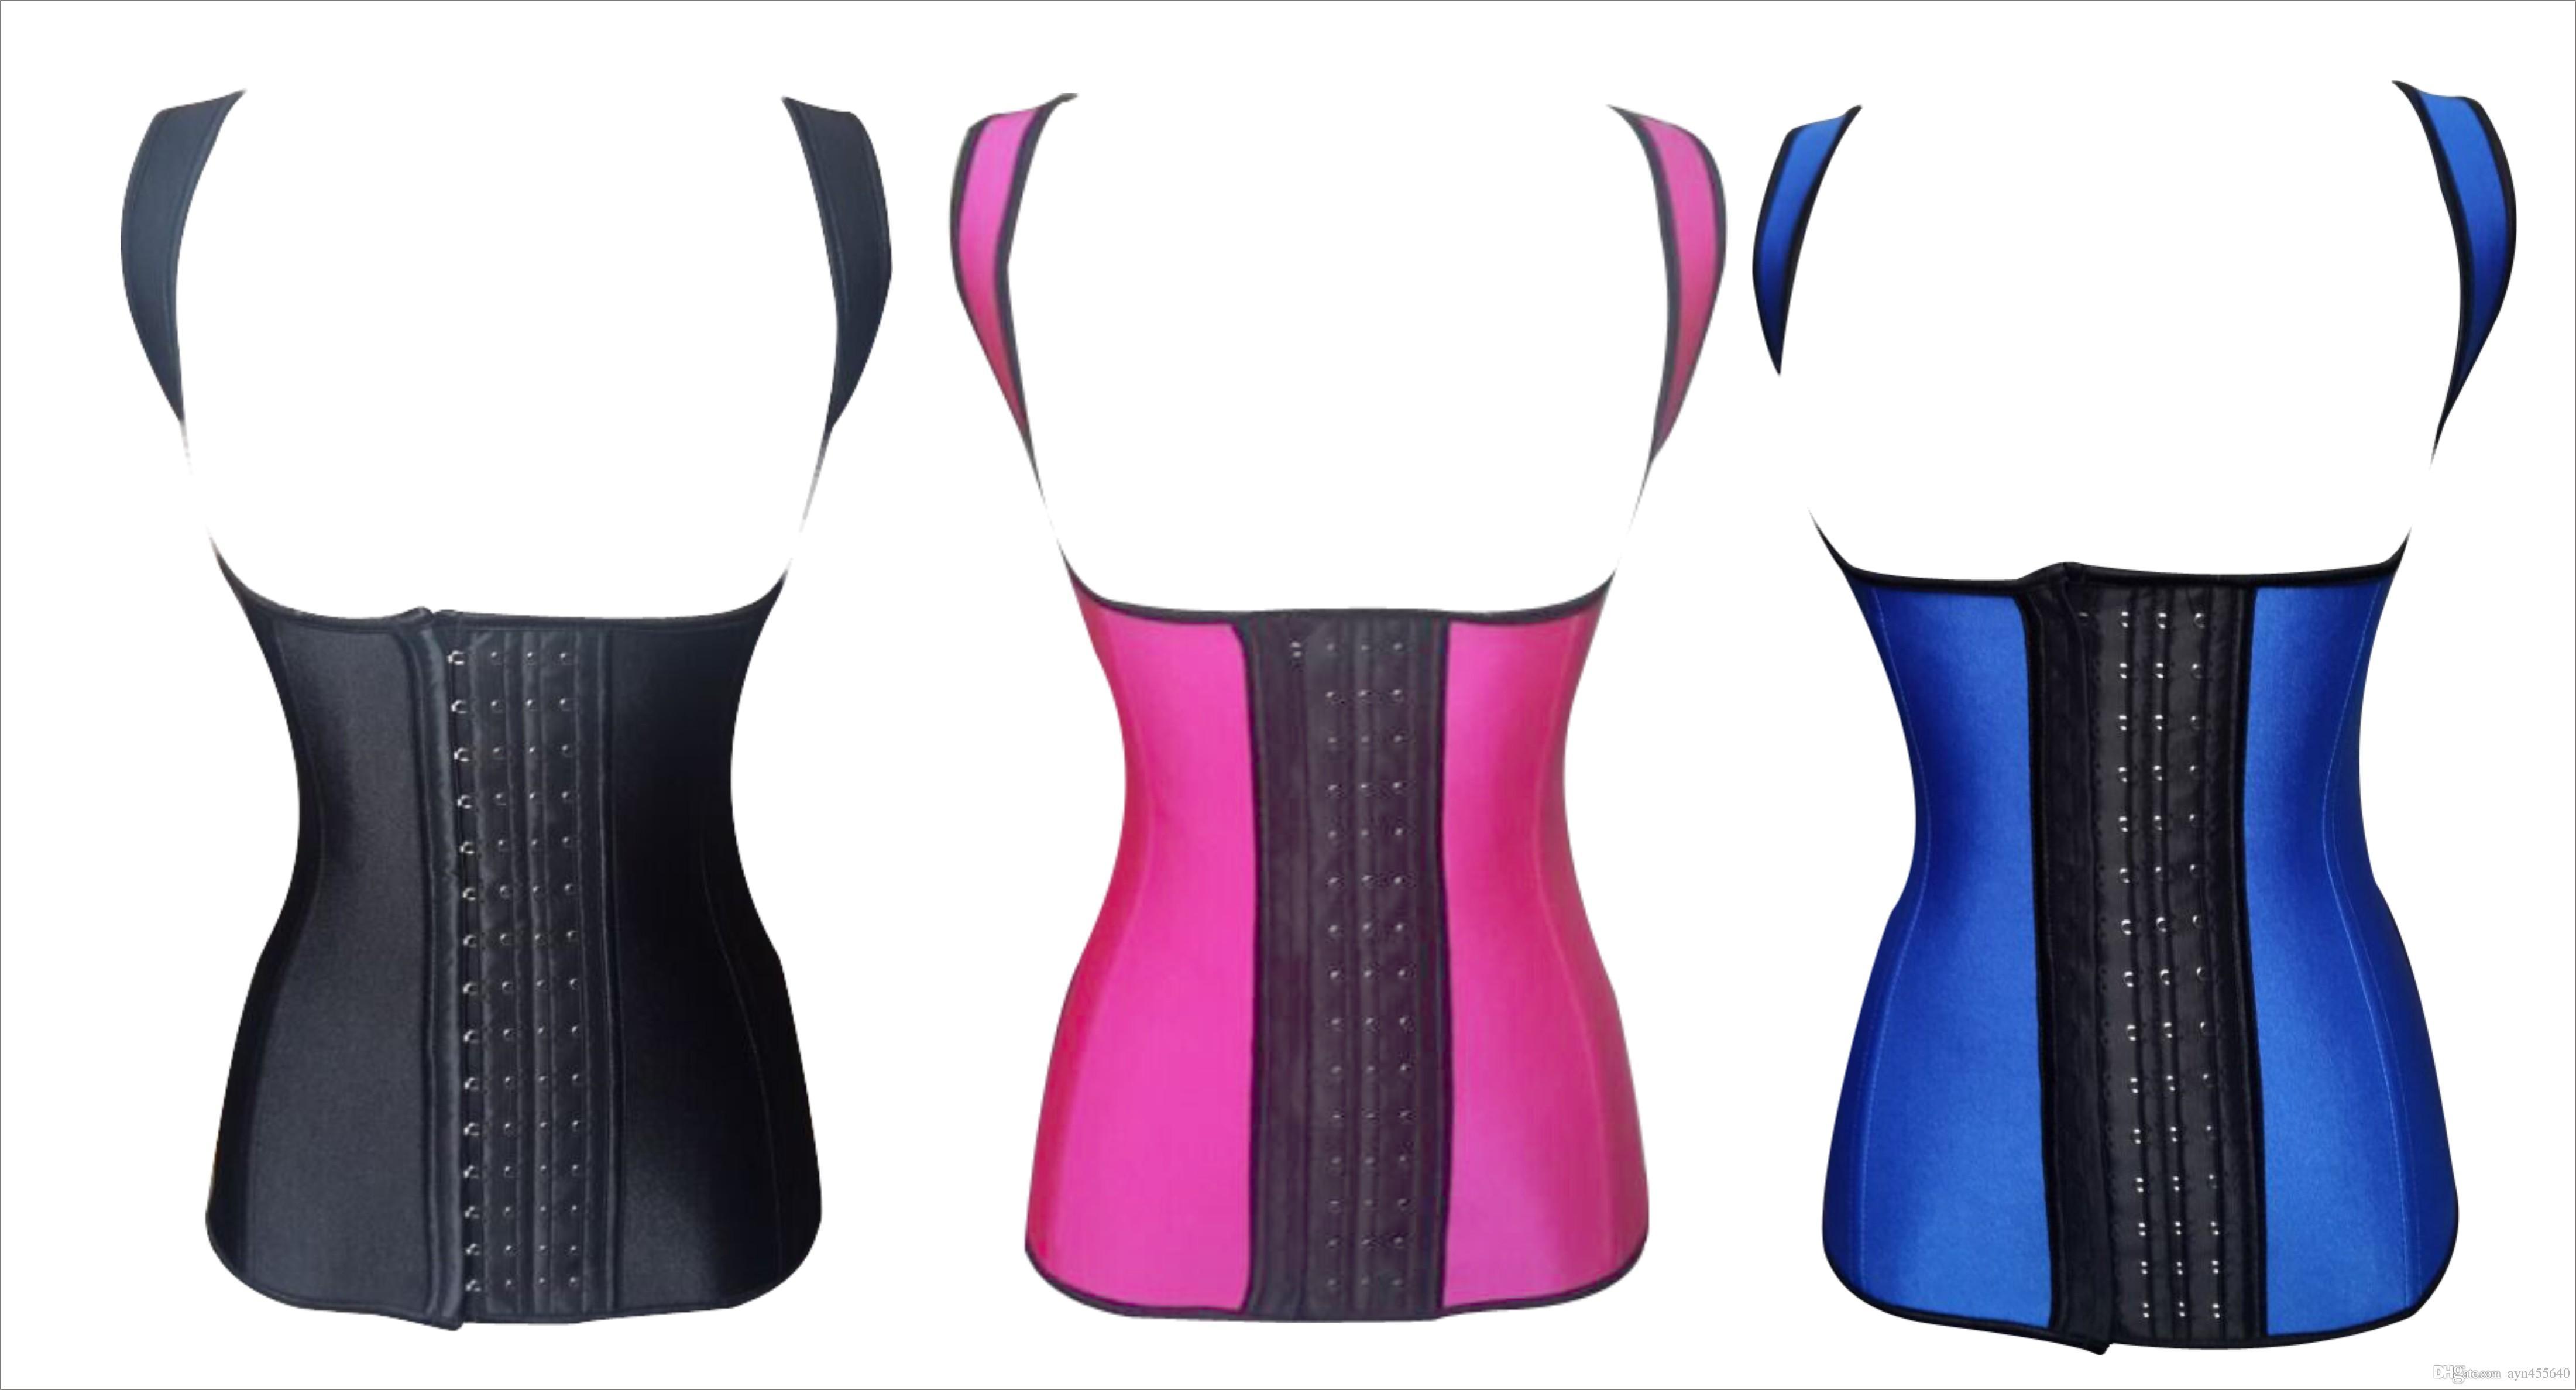 d50771a7de 2019 2015 Sexy Latex Body Shaper Steel Boned Waist Waist Training Corset  Vest Latex Waist Trainer Cincher Corset Postpartum Slimming Shapewear From  ...